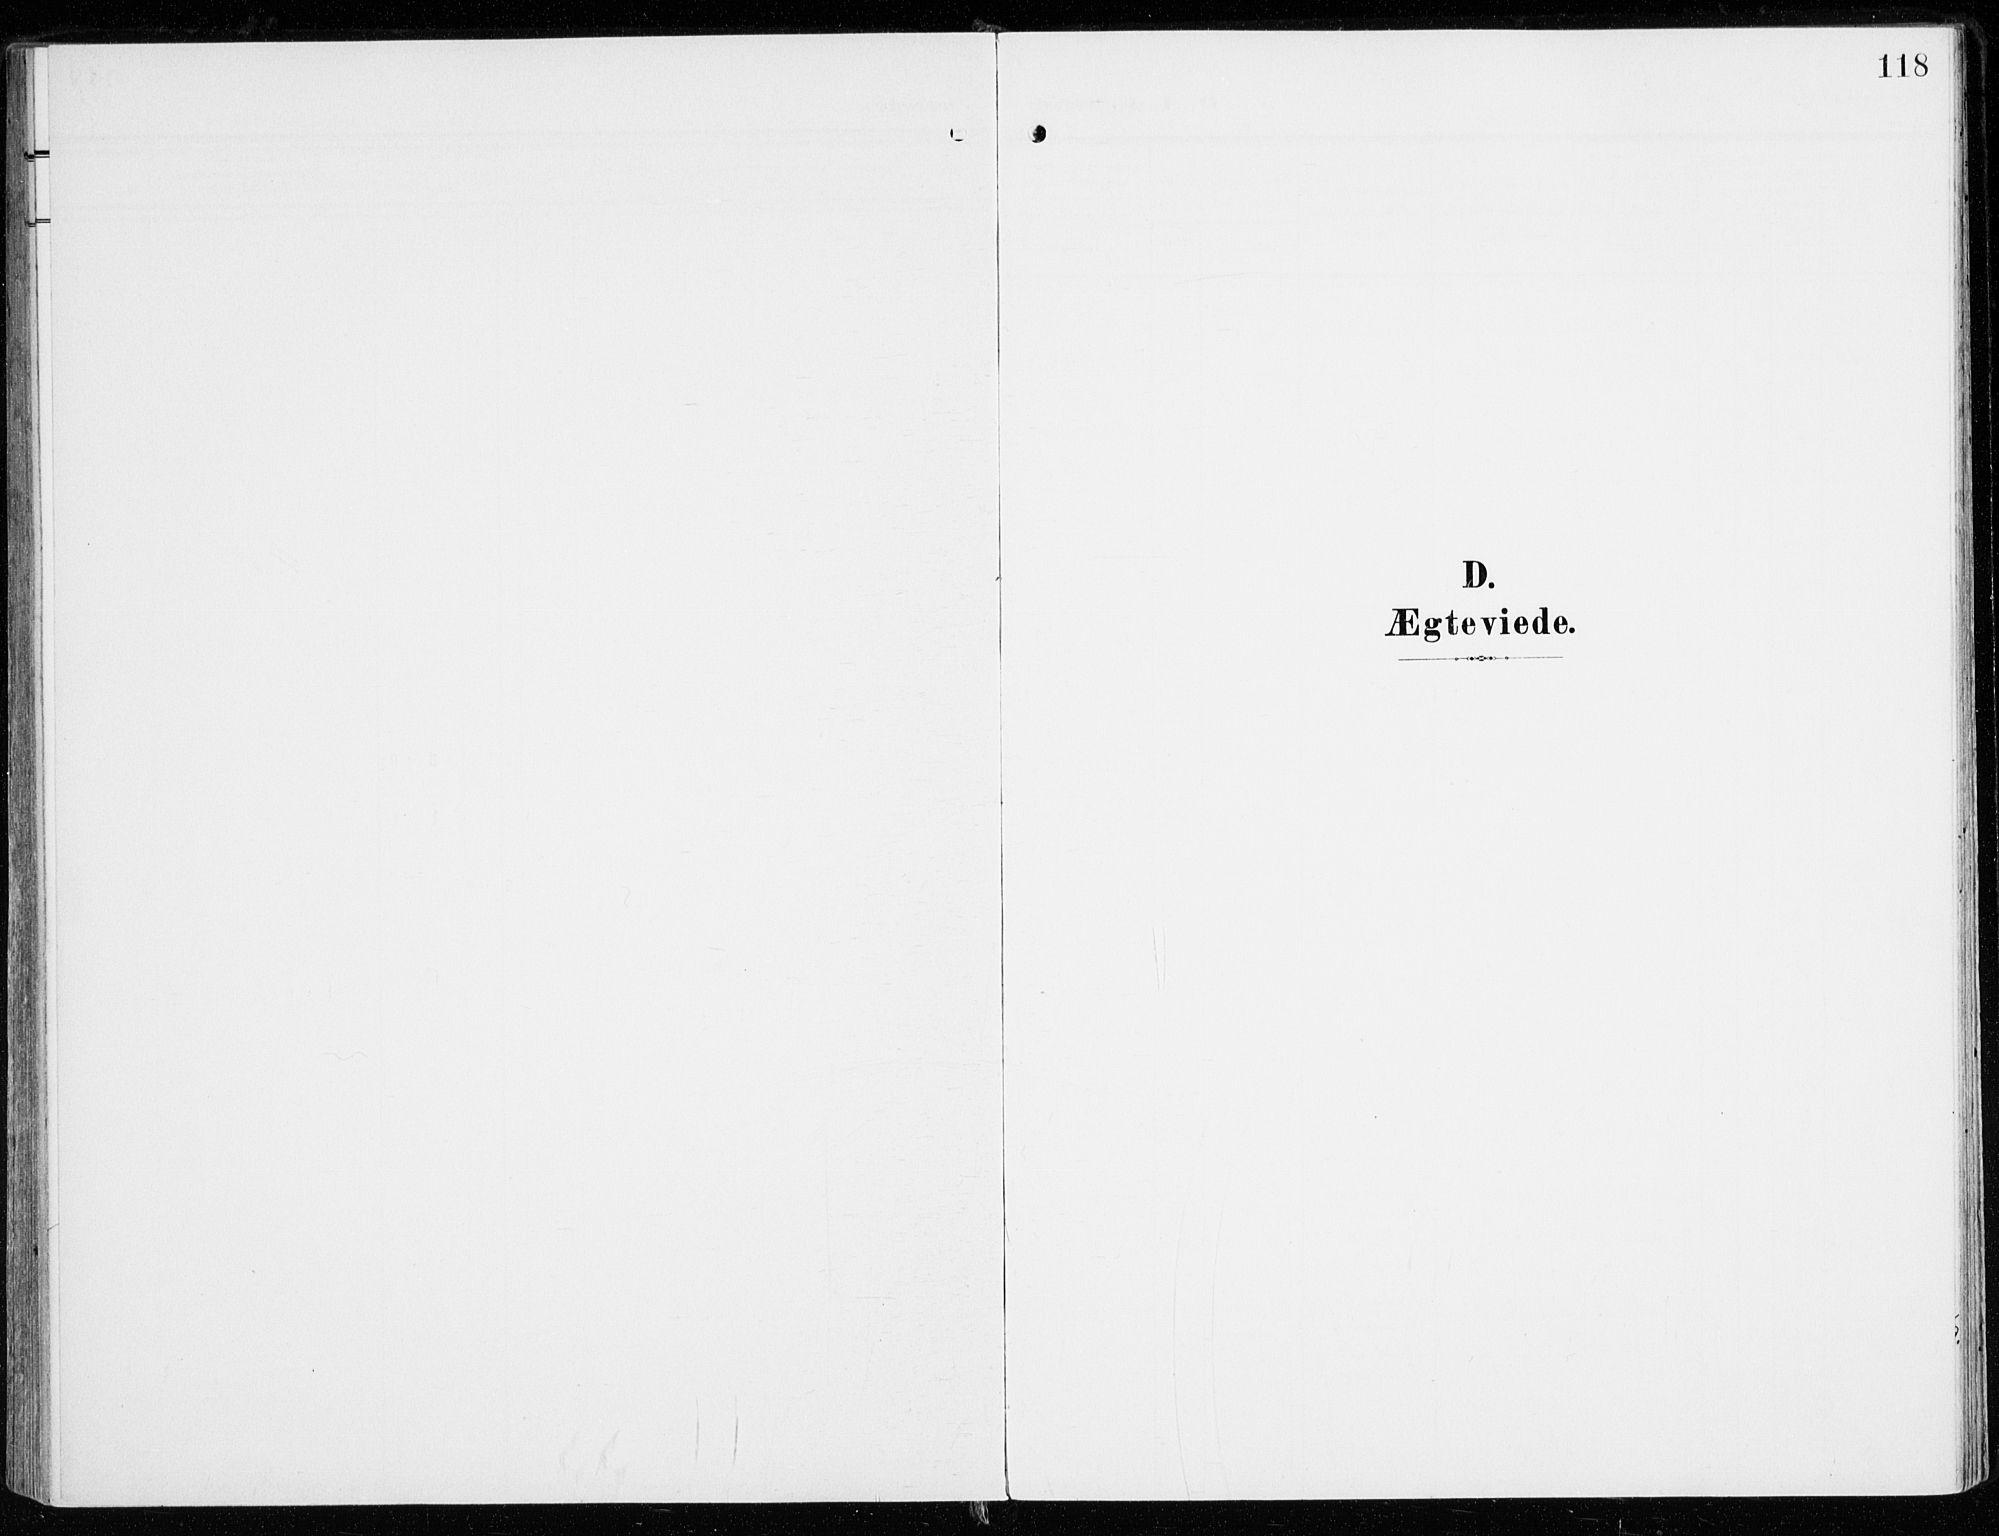 SAH, Sel prestekontor, Ministerialbok nr. 2, 1905-1919, s. 118